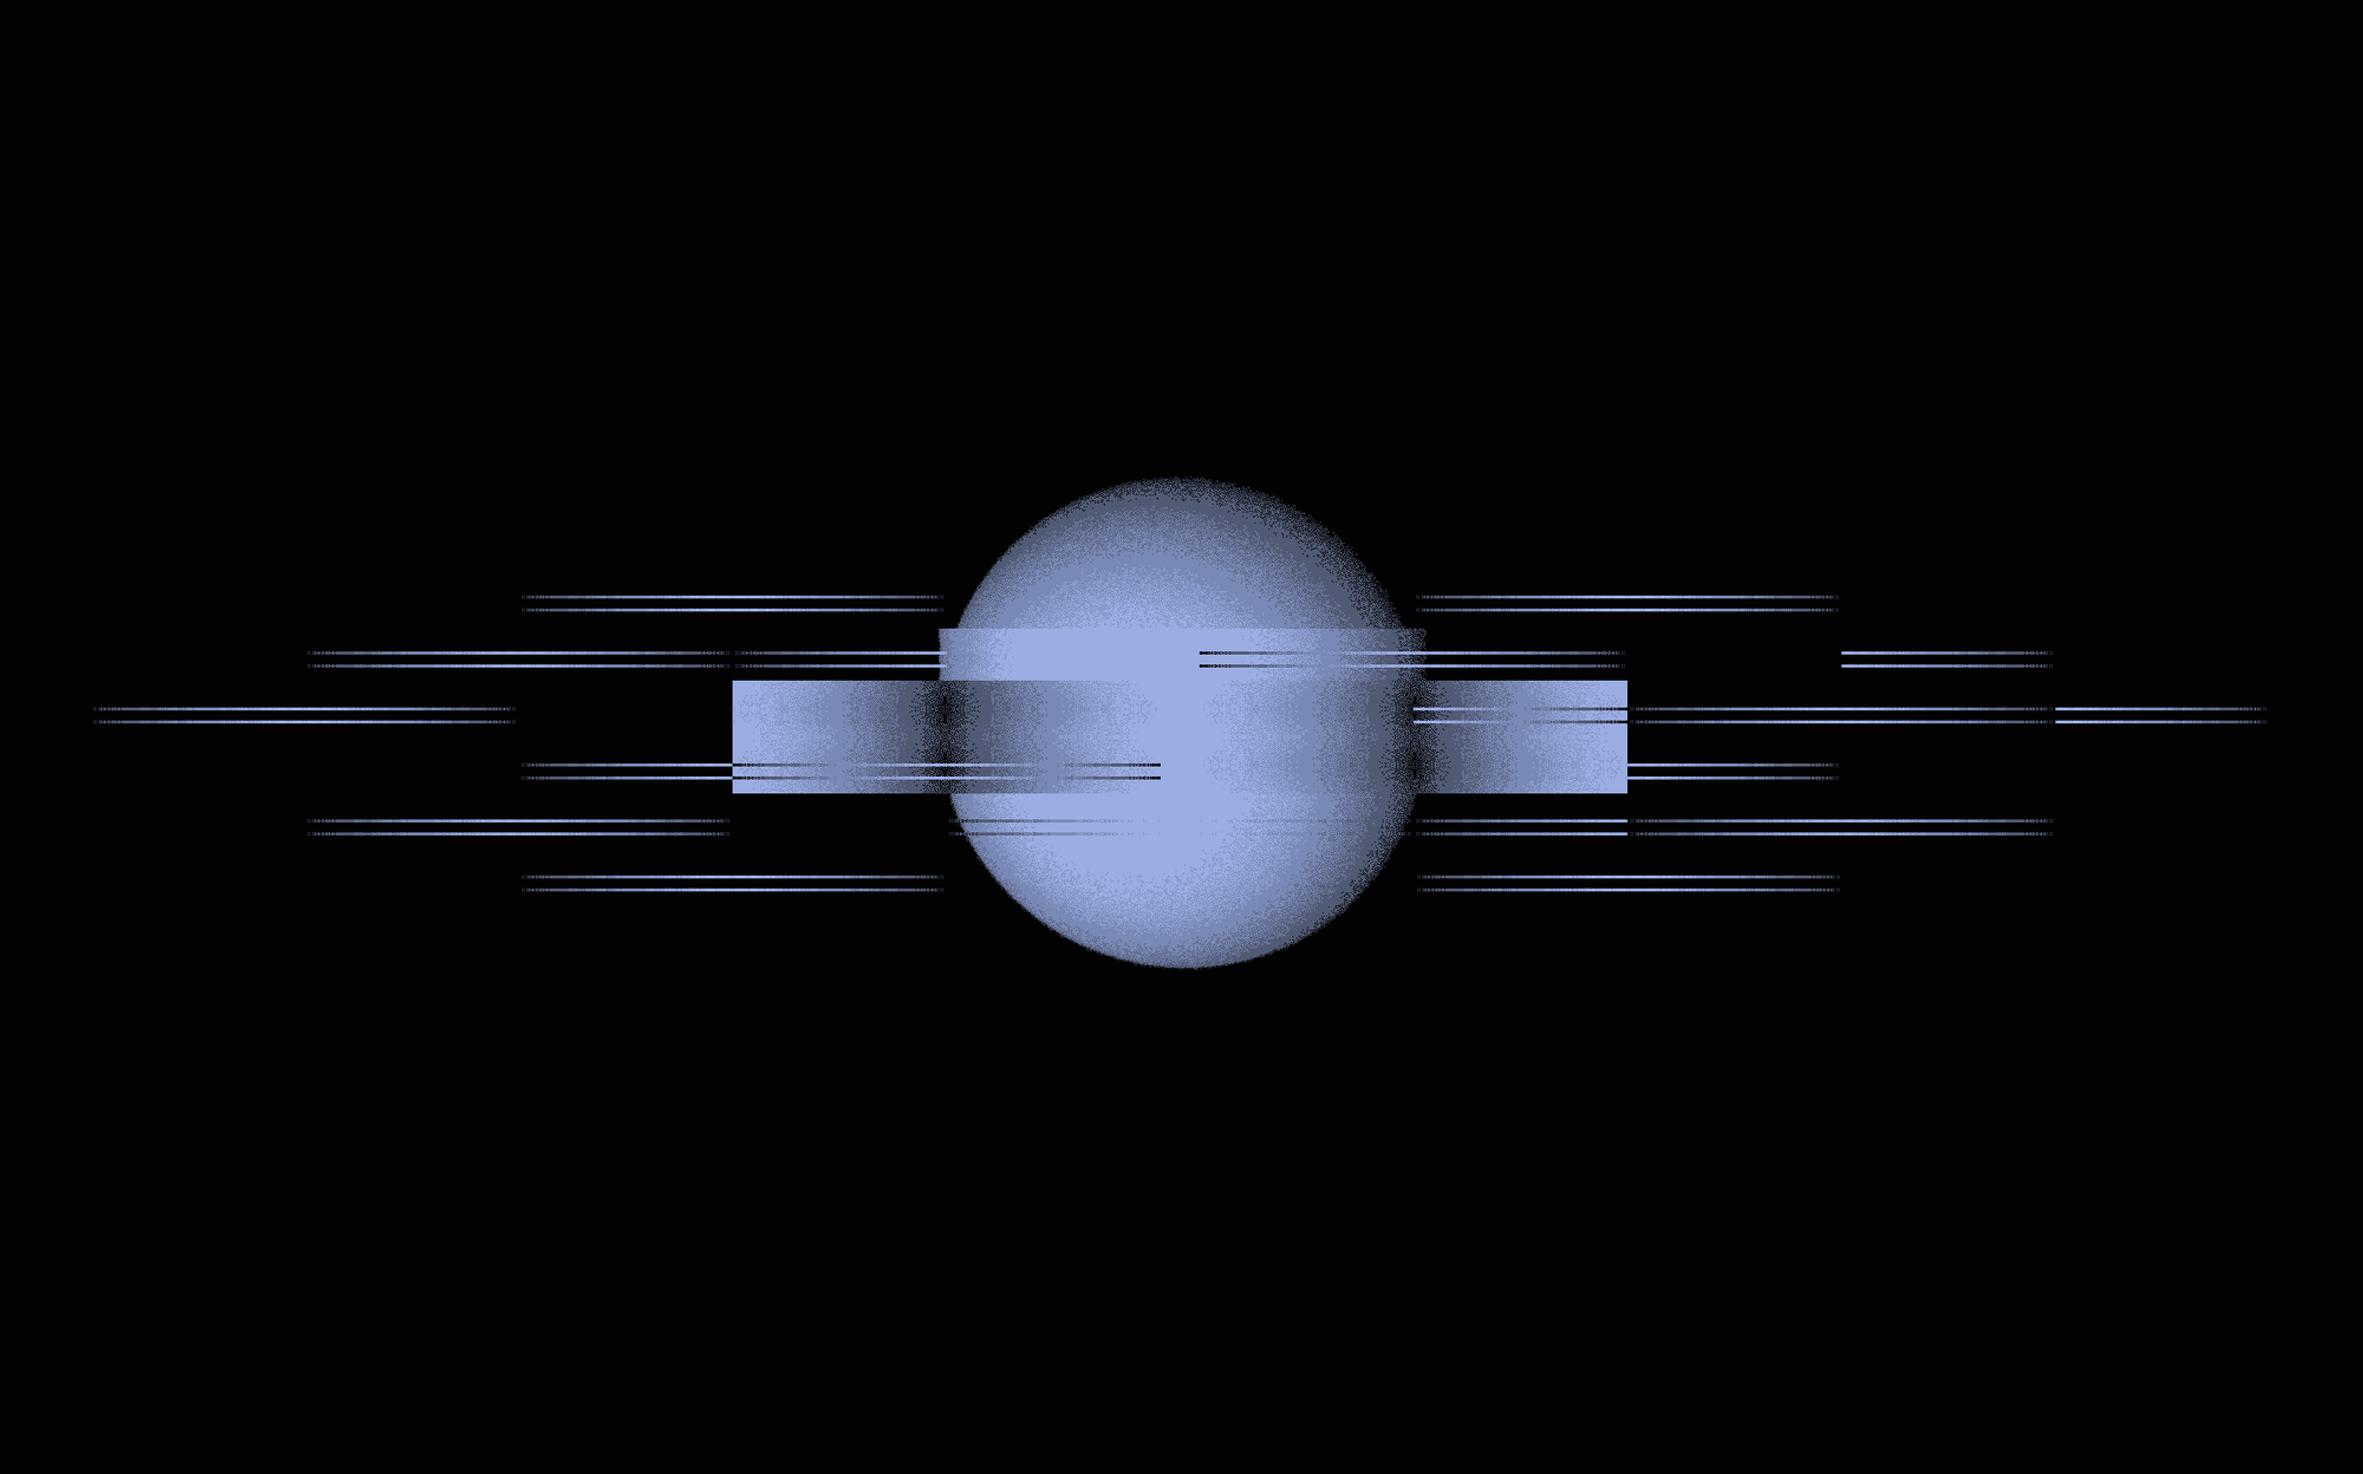 A-Borisov_Uranus_CG_2363x1474_01.png